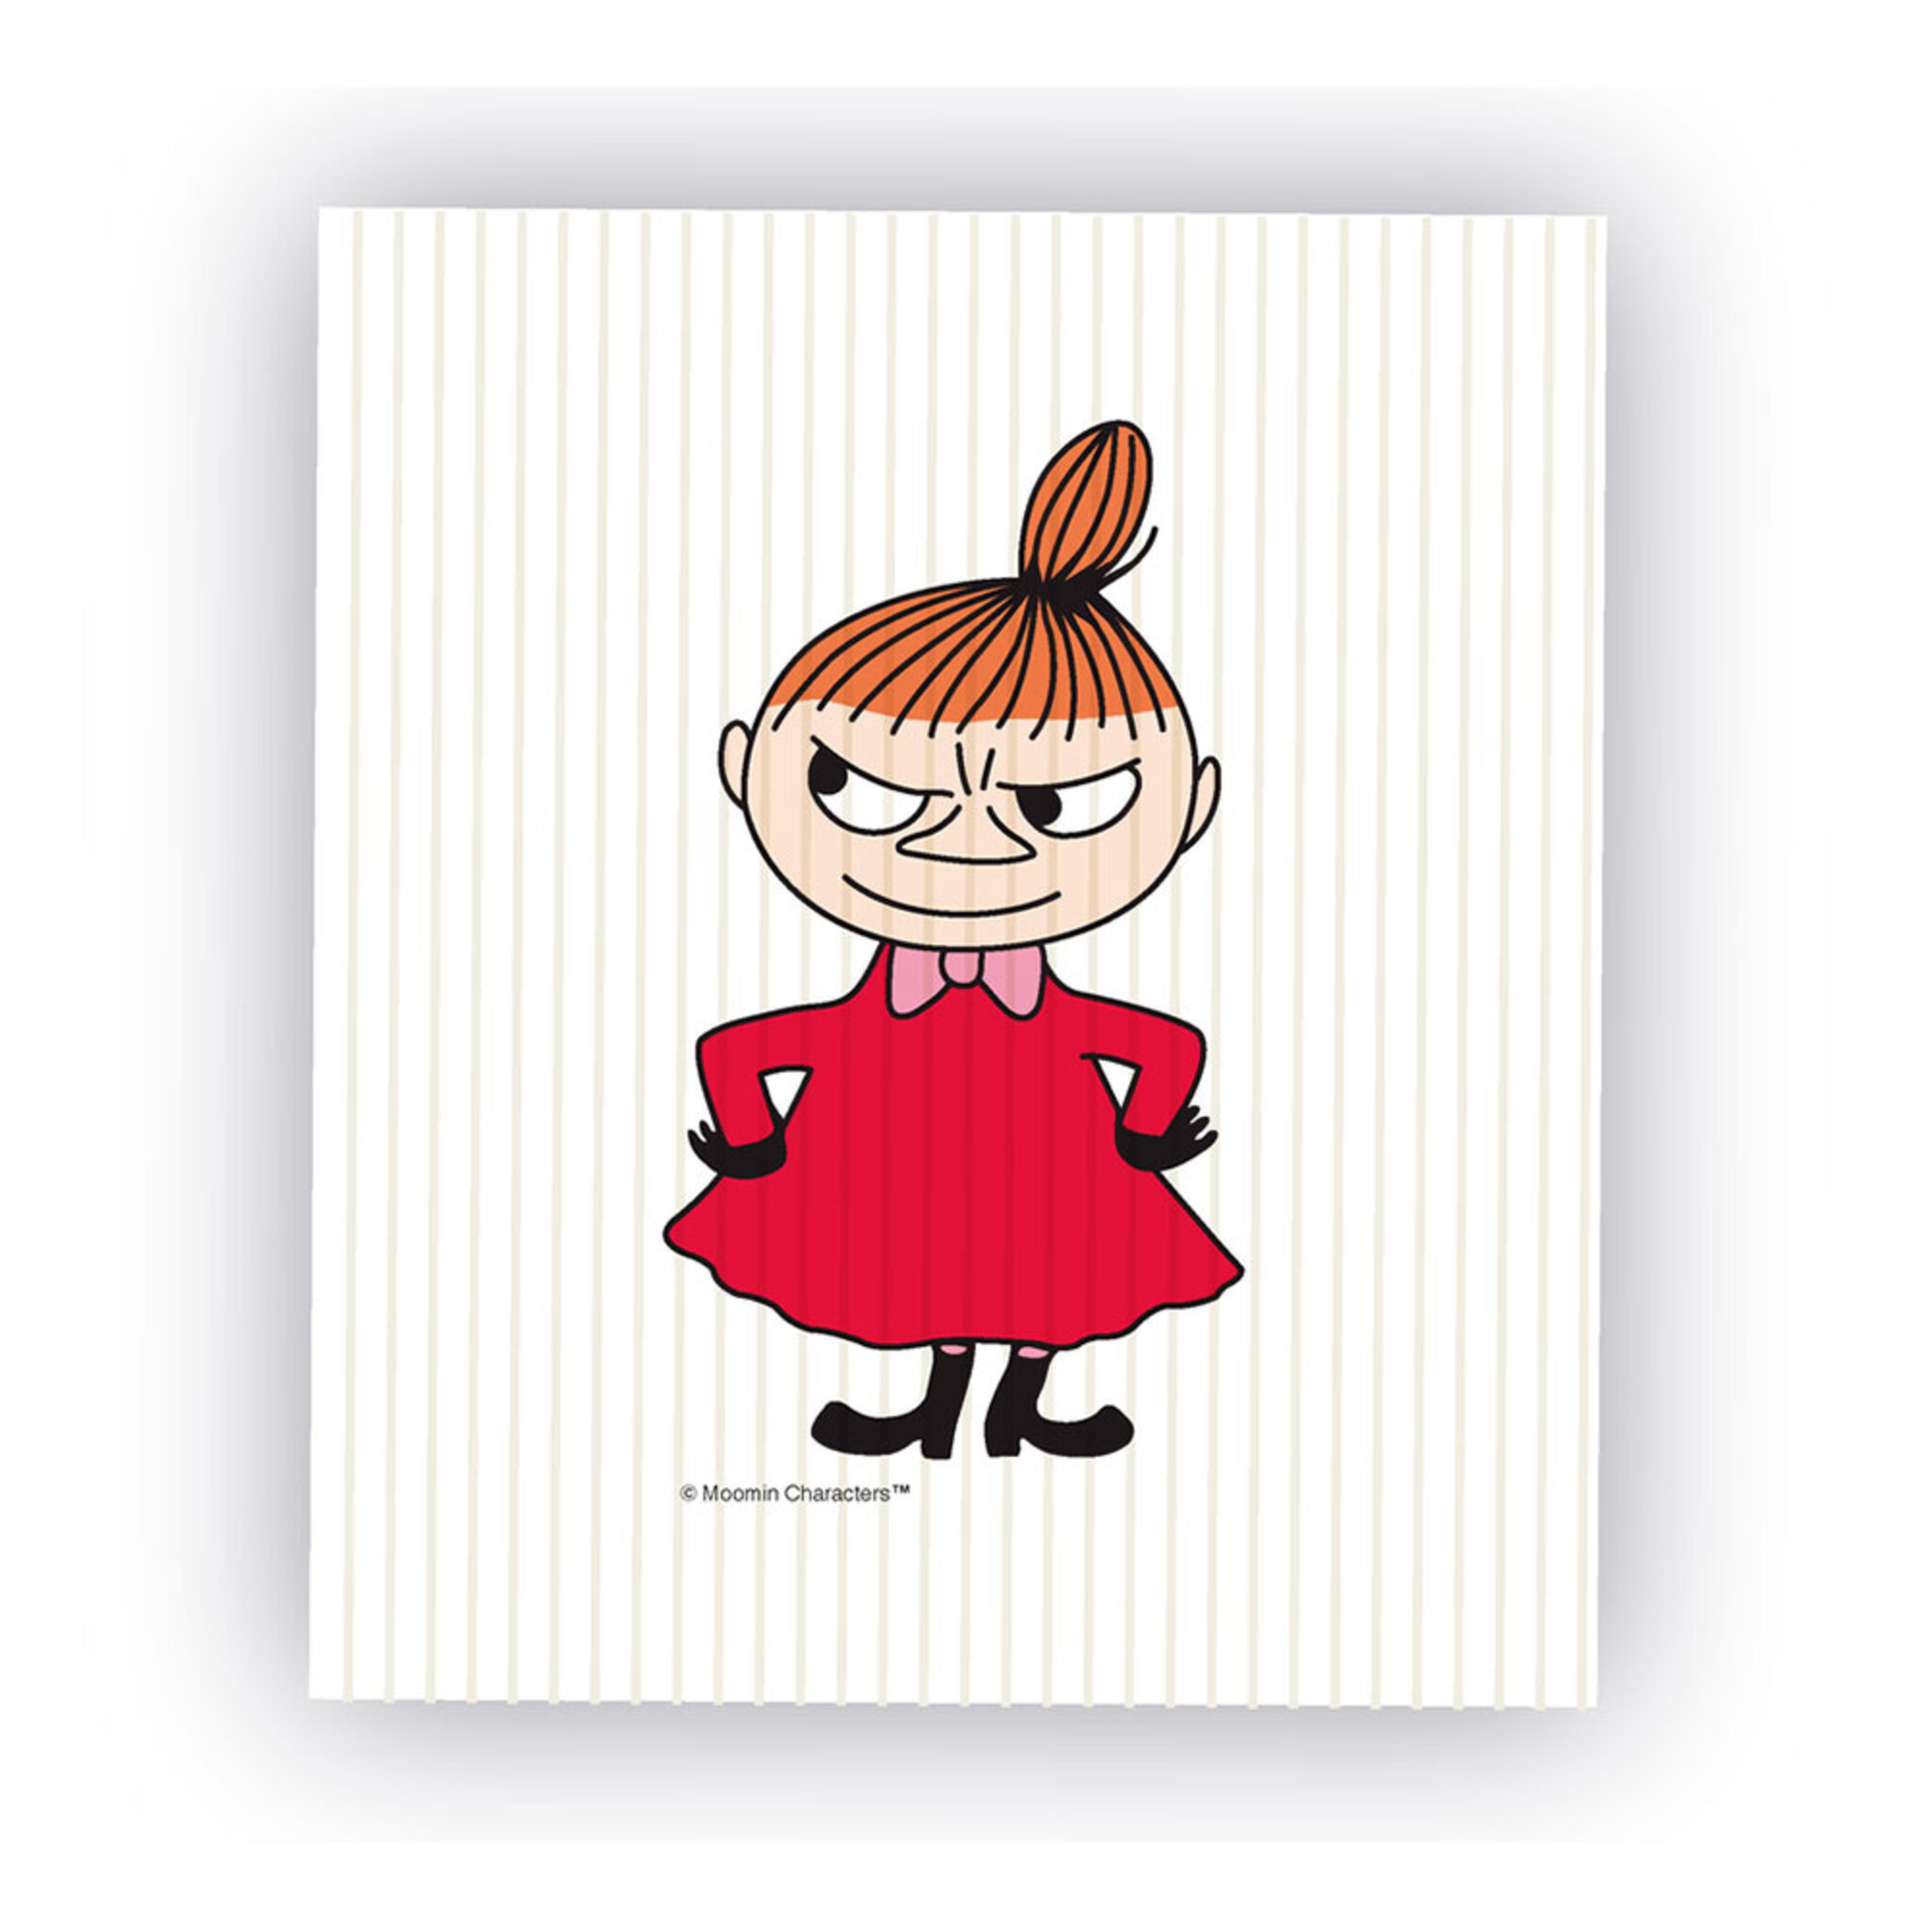 Diskduk 'Lilla My' 5-pack, 21x20